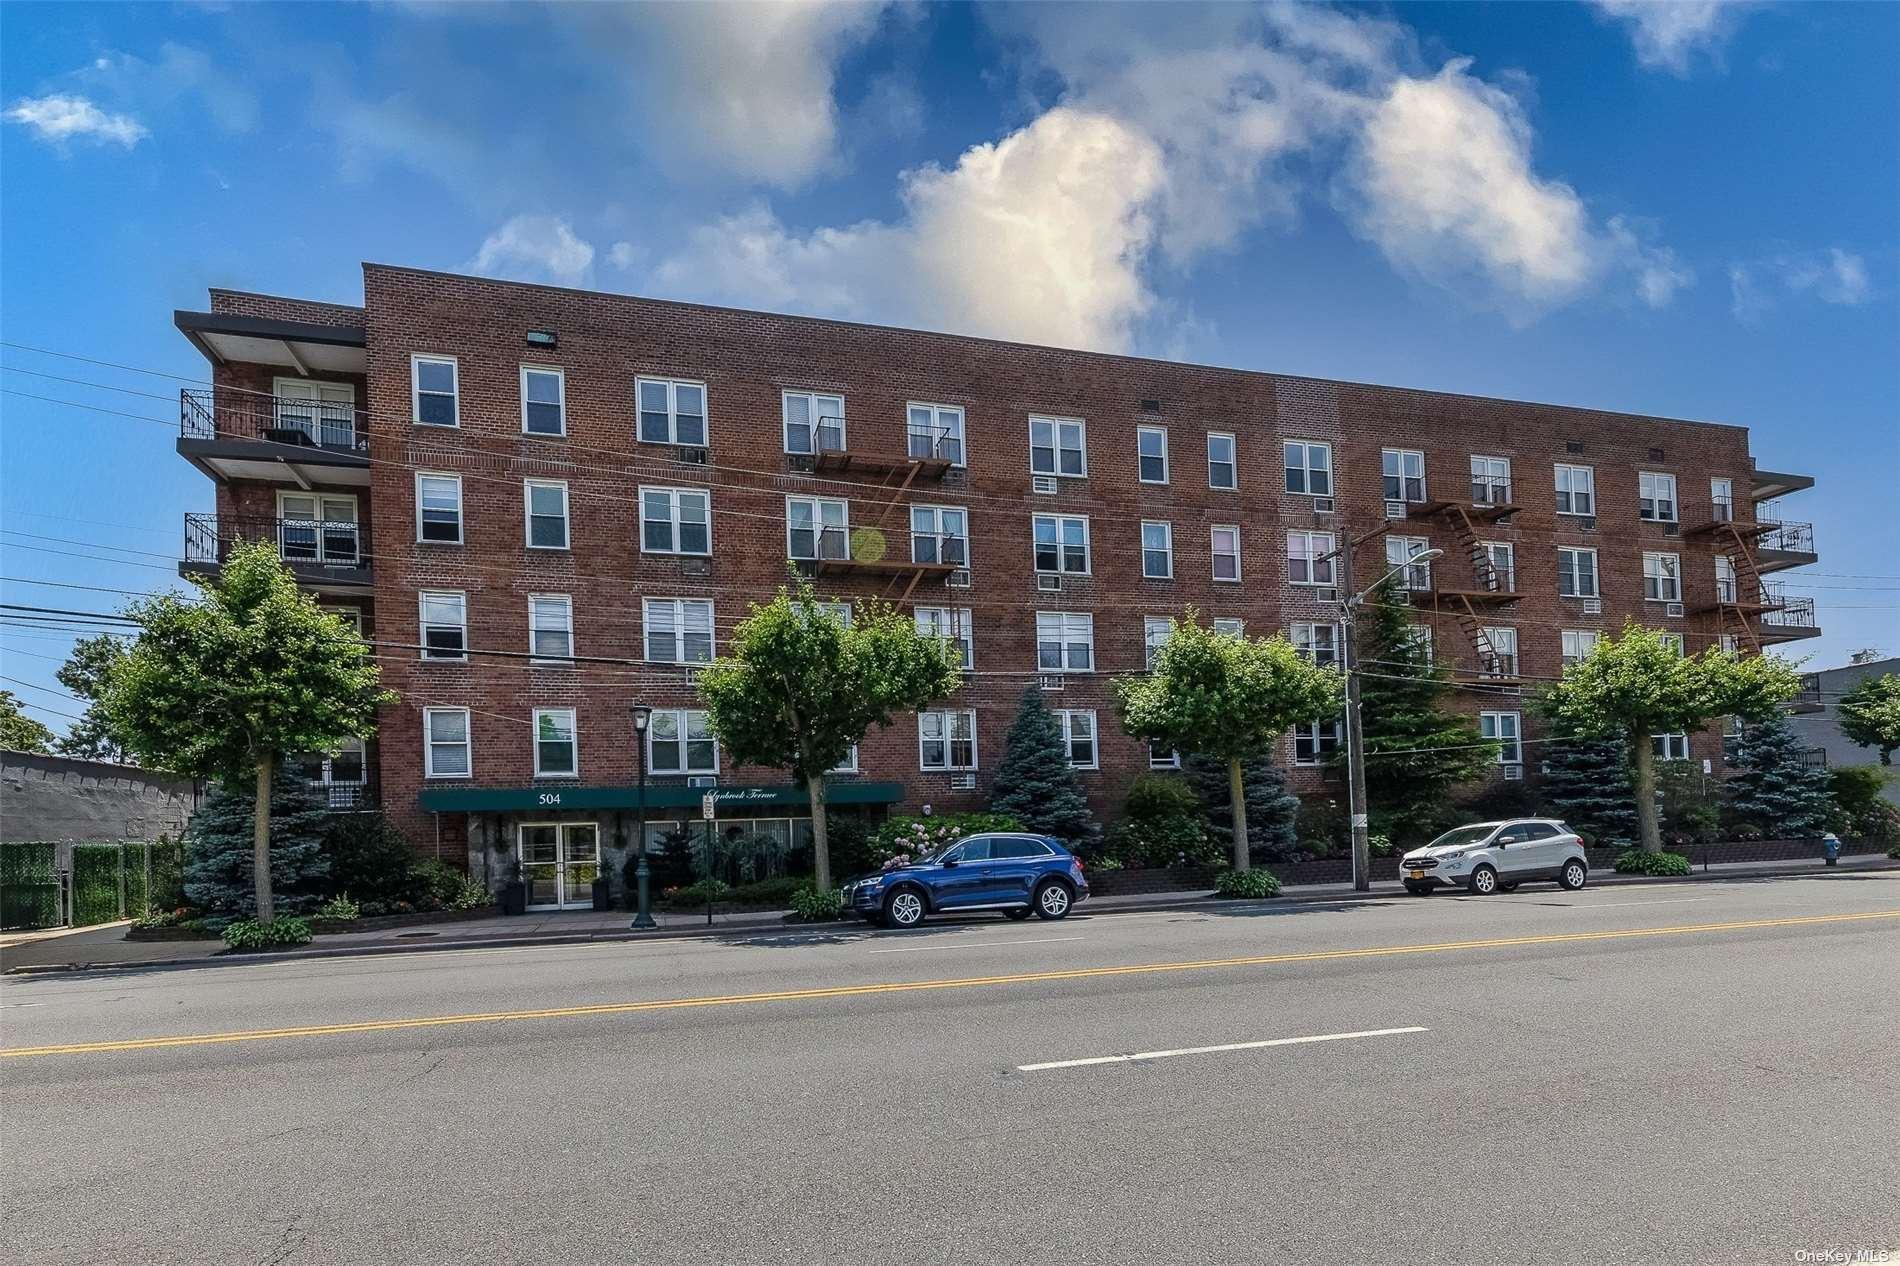 504 Merrick Road #1F, Lynbrook, NY 11563 - MLS#: 3330592